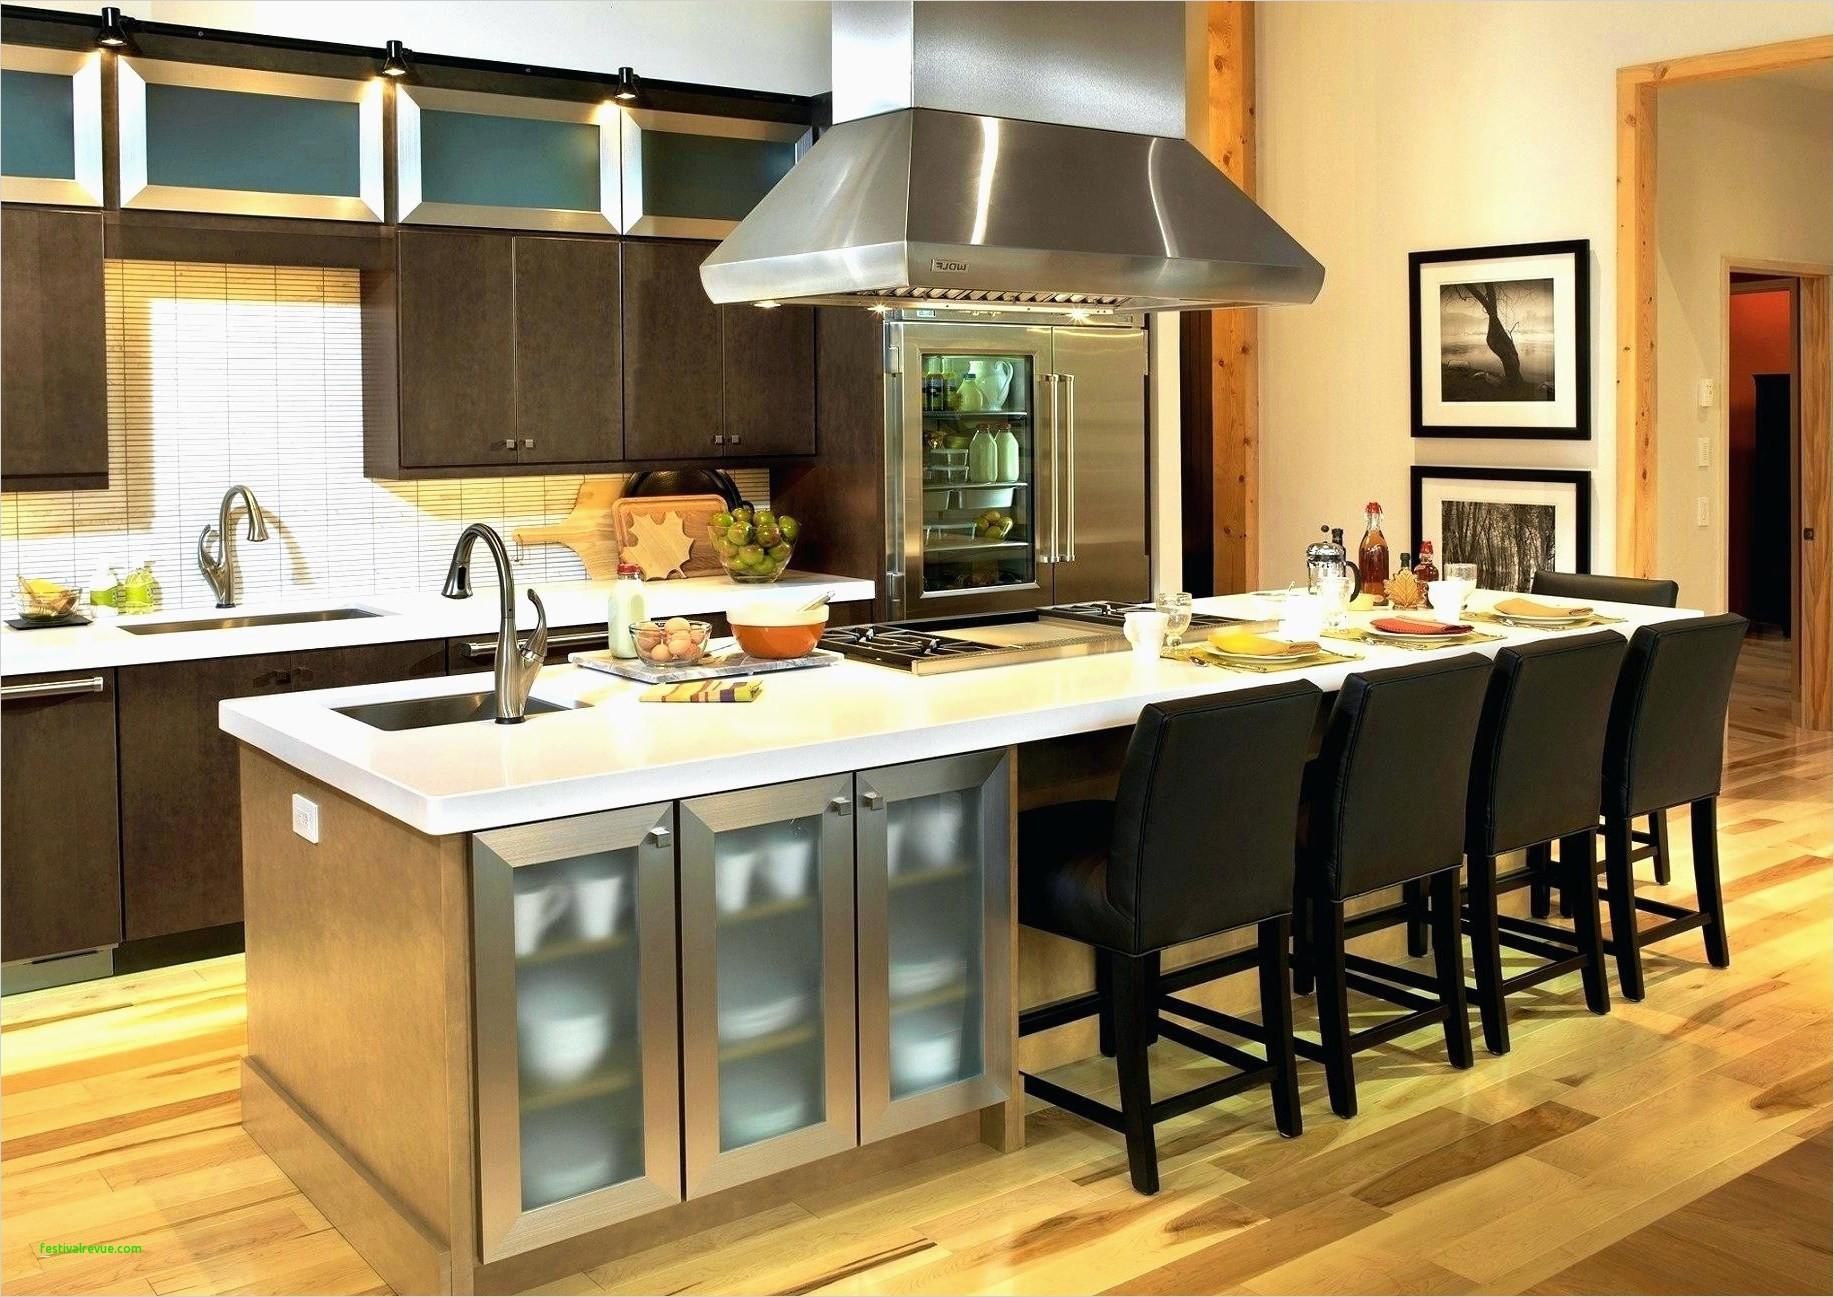 hardwood floor refinishing columbus ohio of 14 best of modern kitchen design ideas stock dizpos com inside modern kitchen design ideas best of 44 unique modern kitchen design ideas pic image of 14